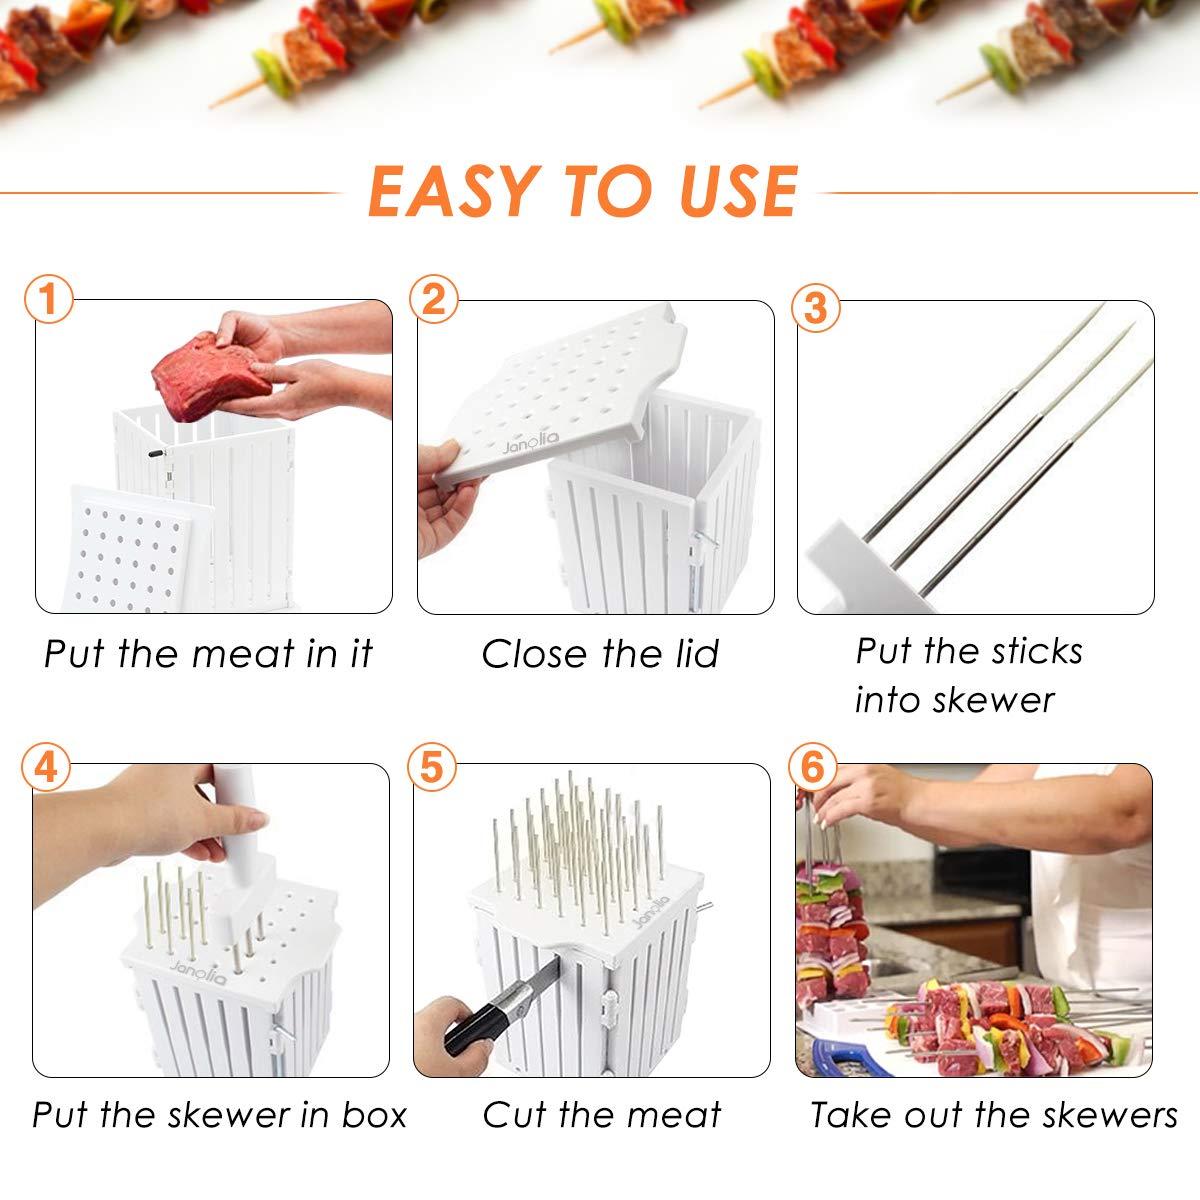 Amazon.com: janolia 36 agujero pinchos de alimentos ...